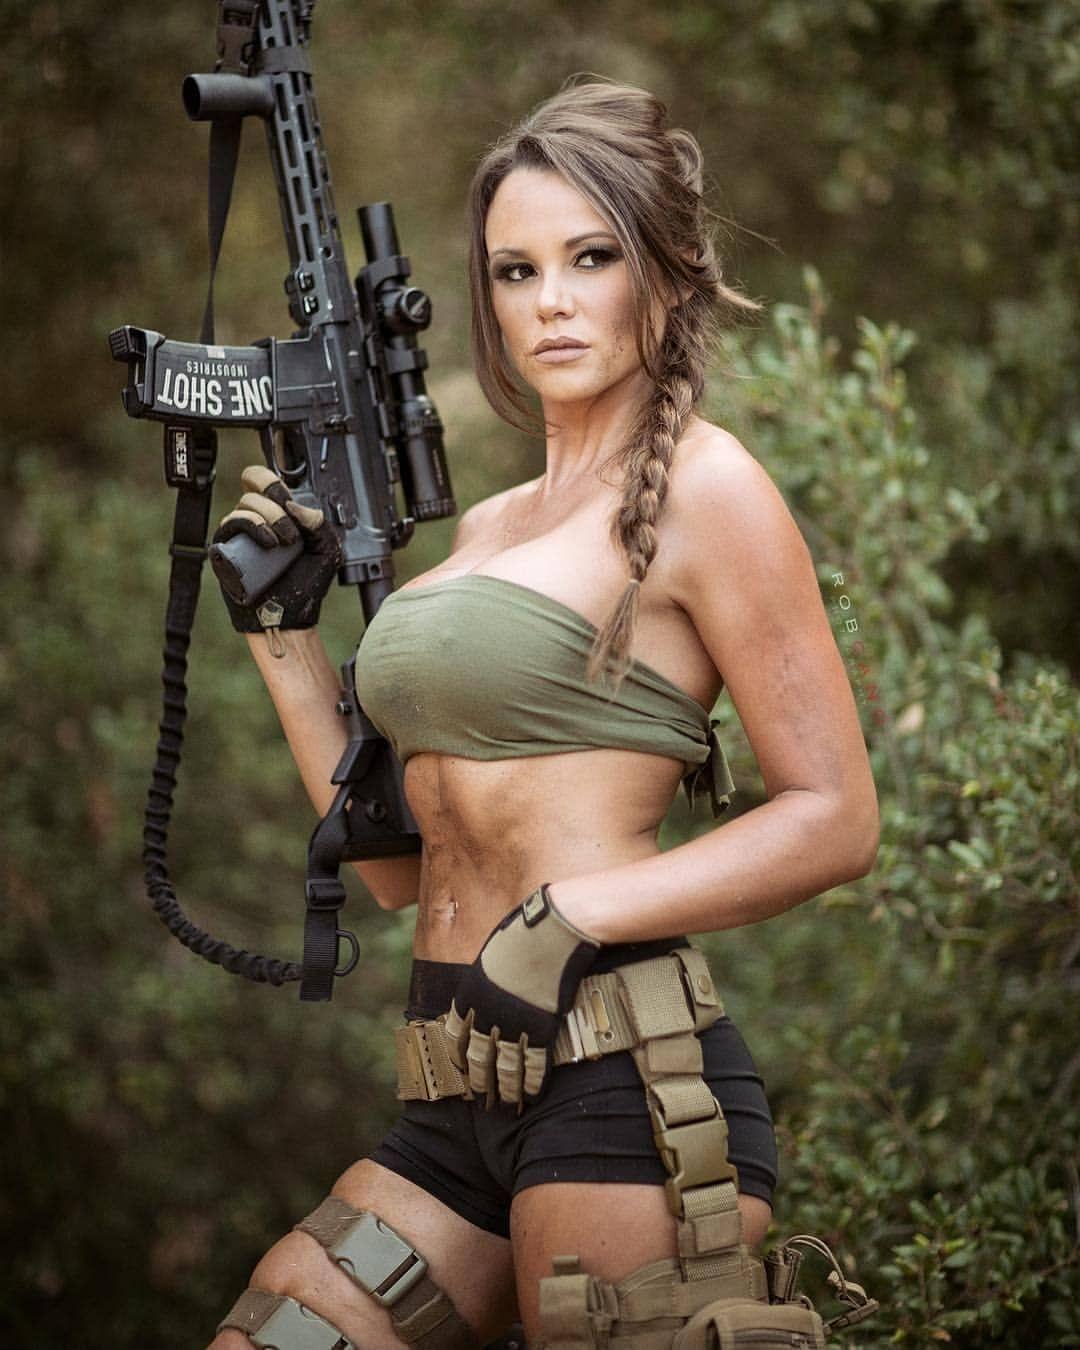 Military girls don't obstruct commander shoving